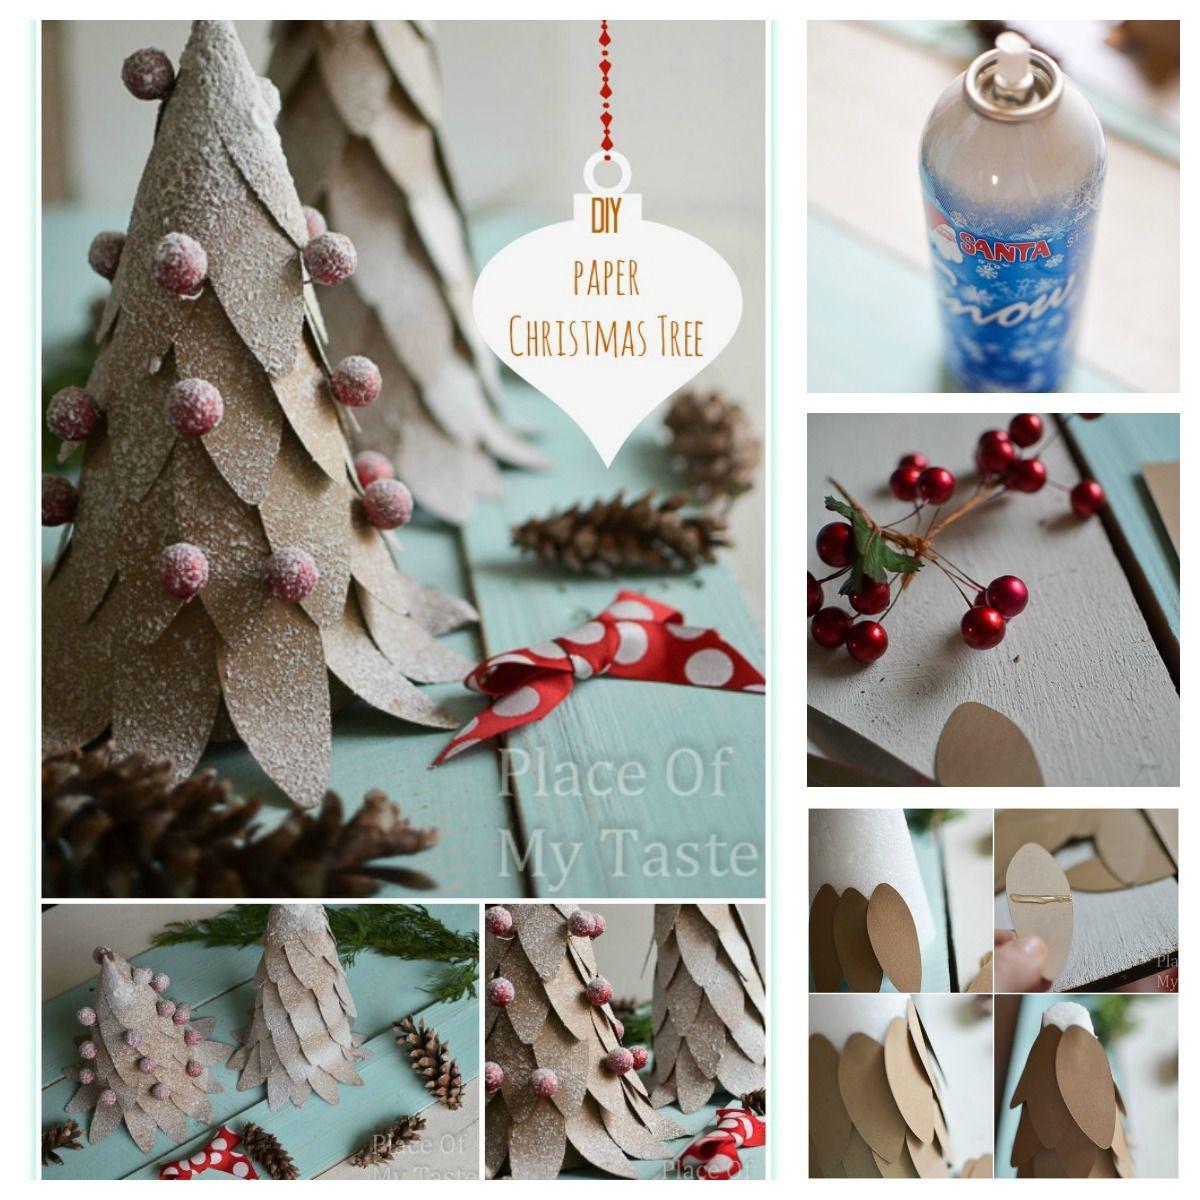 Christmas DIY Crafts  DIY Paper Christmas Tree Craft s and